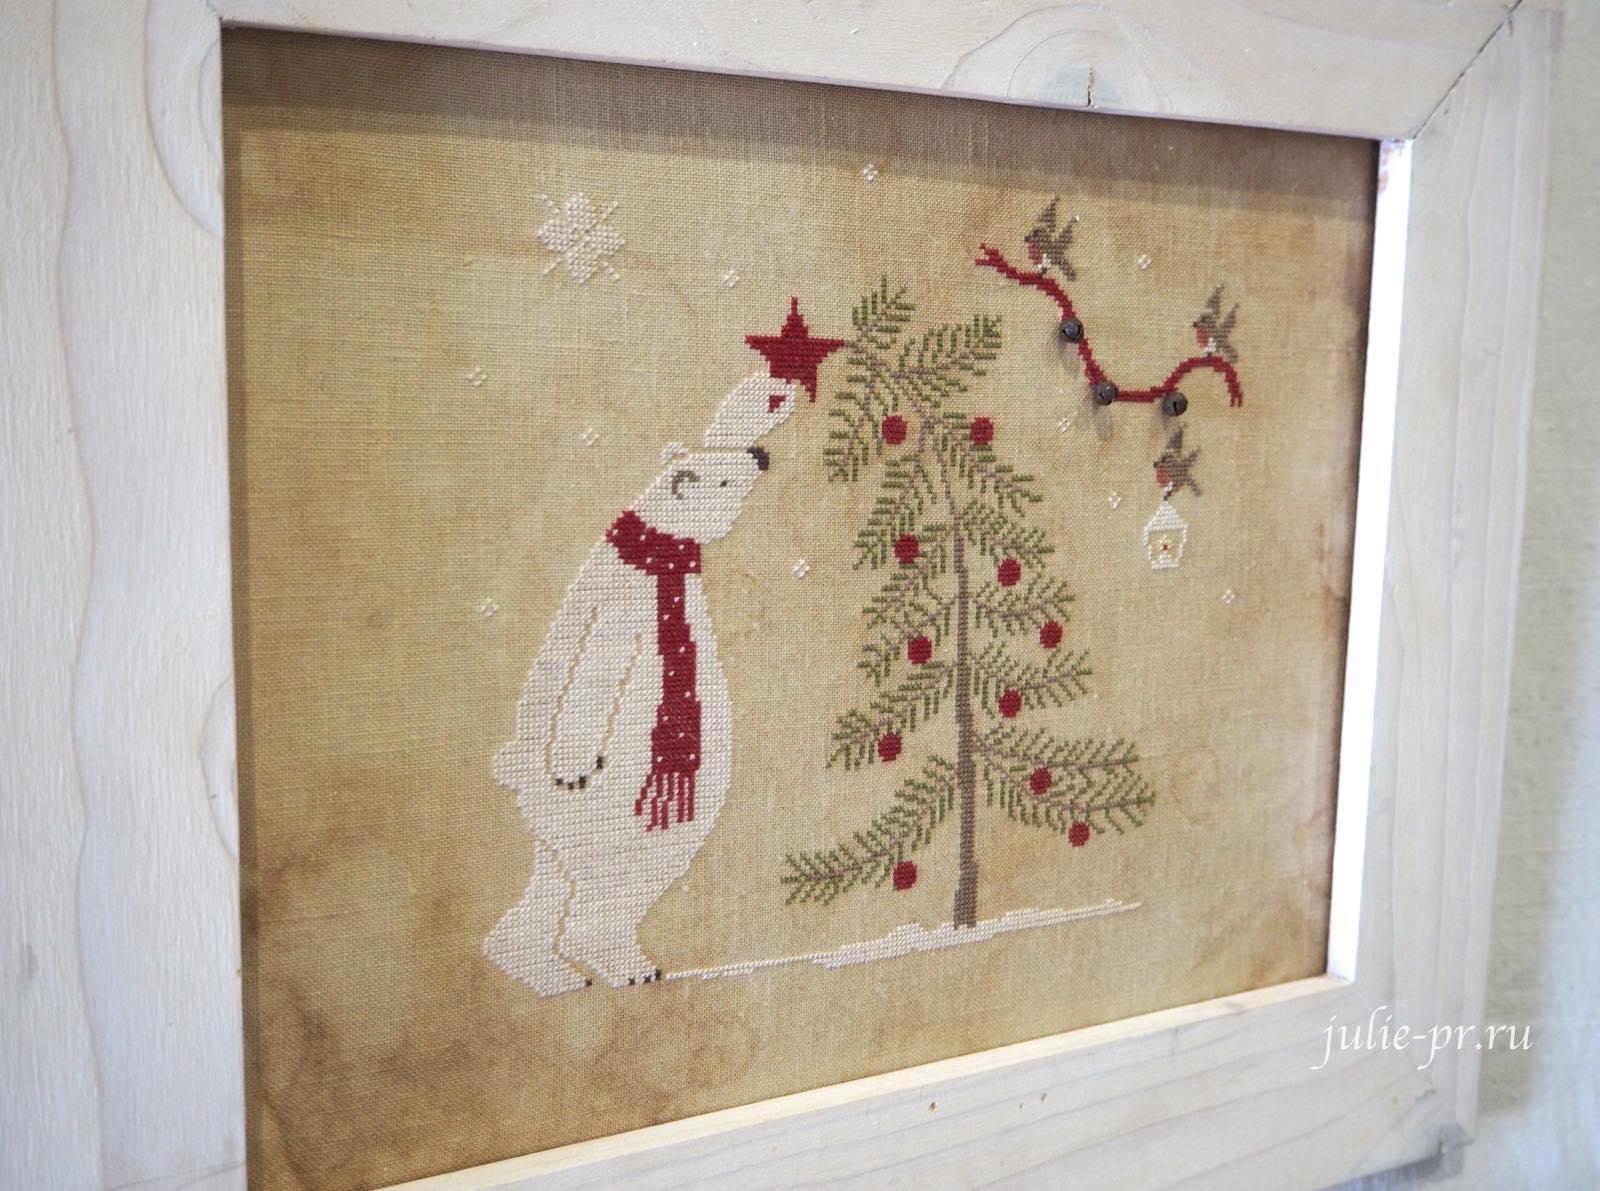 Madame Chantilly, The bear and the Tree, Медведь и елка, вышивка крестом